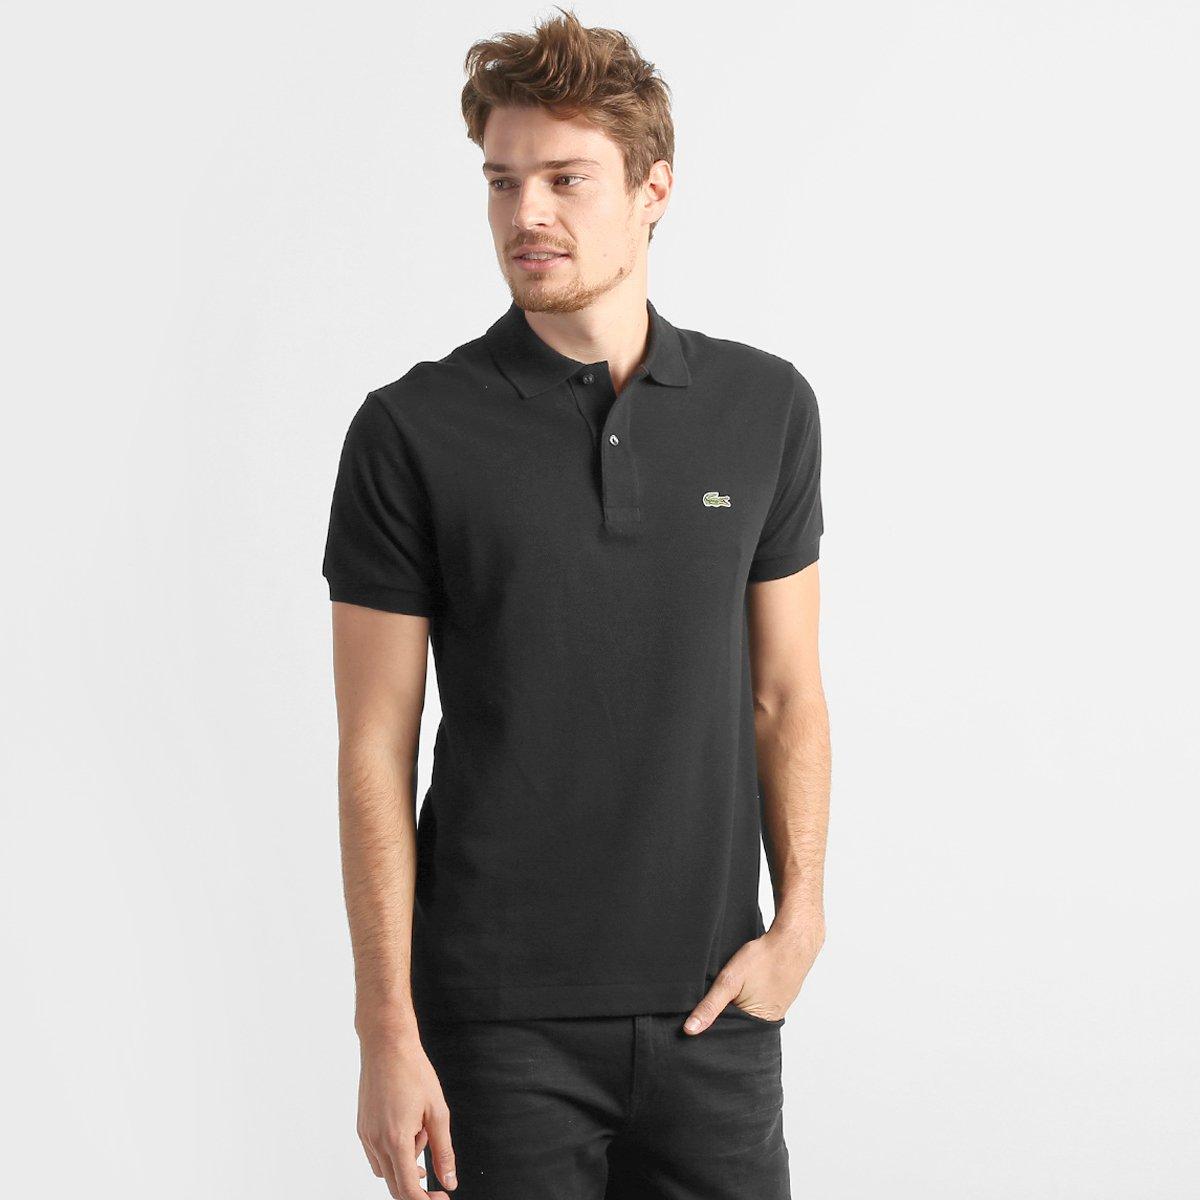 305a22b862b61 Camisa Polo Lacoste Original Fit Masculina - Preto - Compre Agora ...